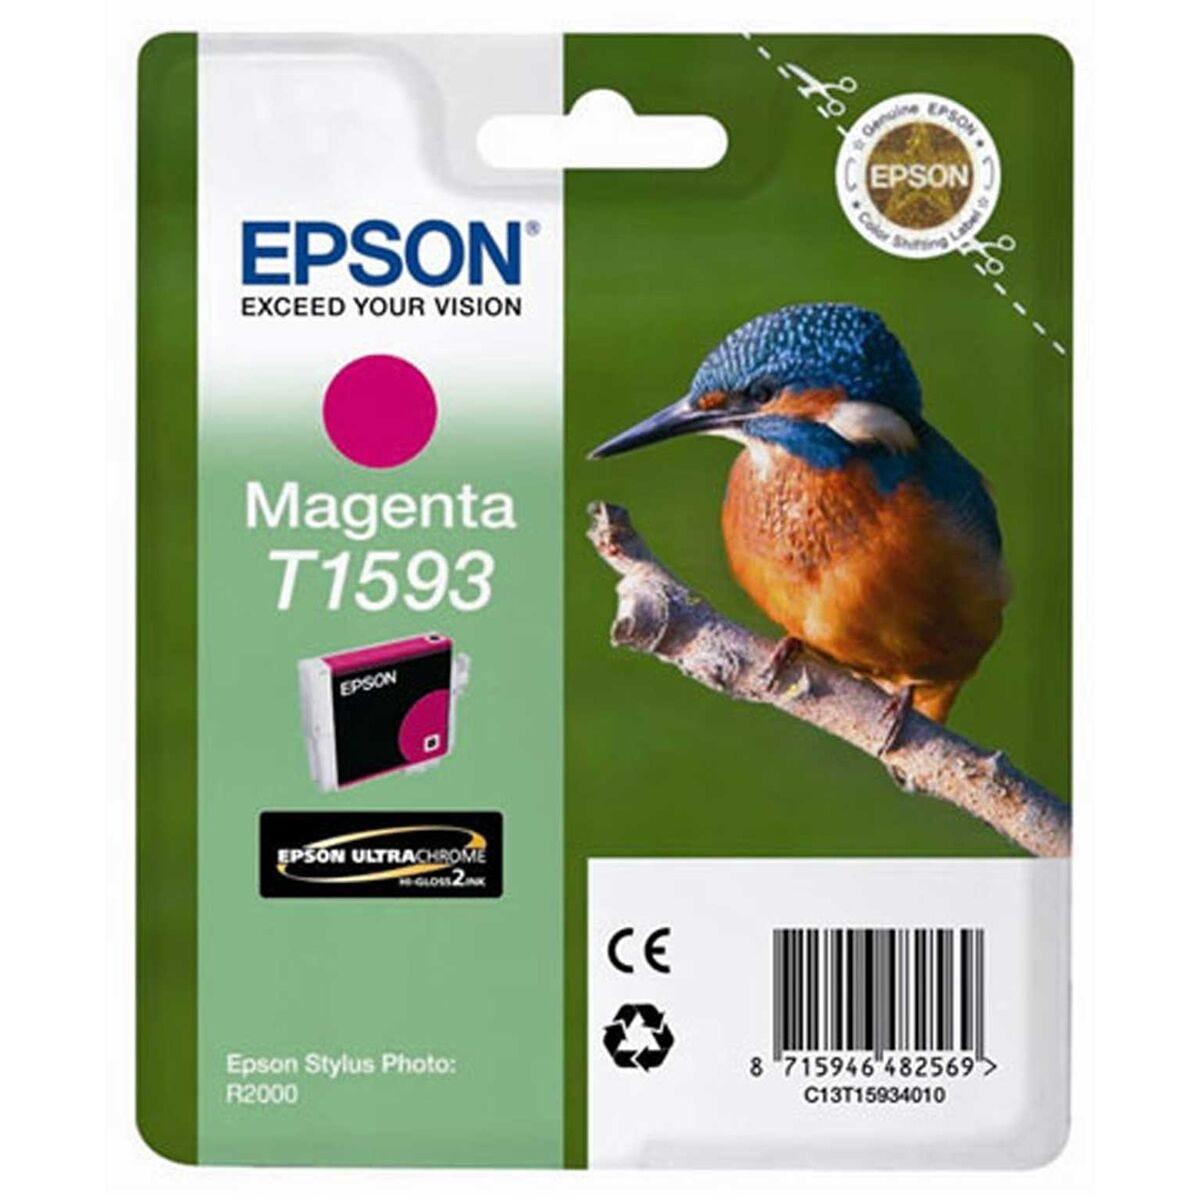 Epson Cartridge T1593 Ink Catridge